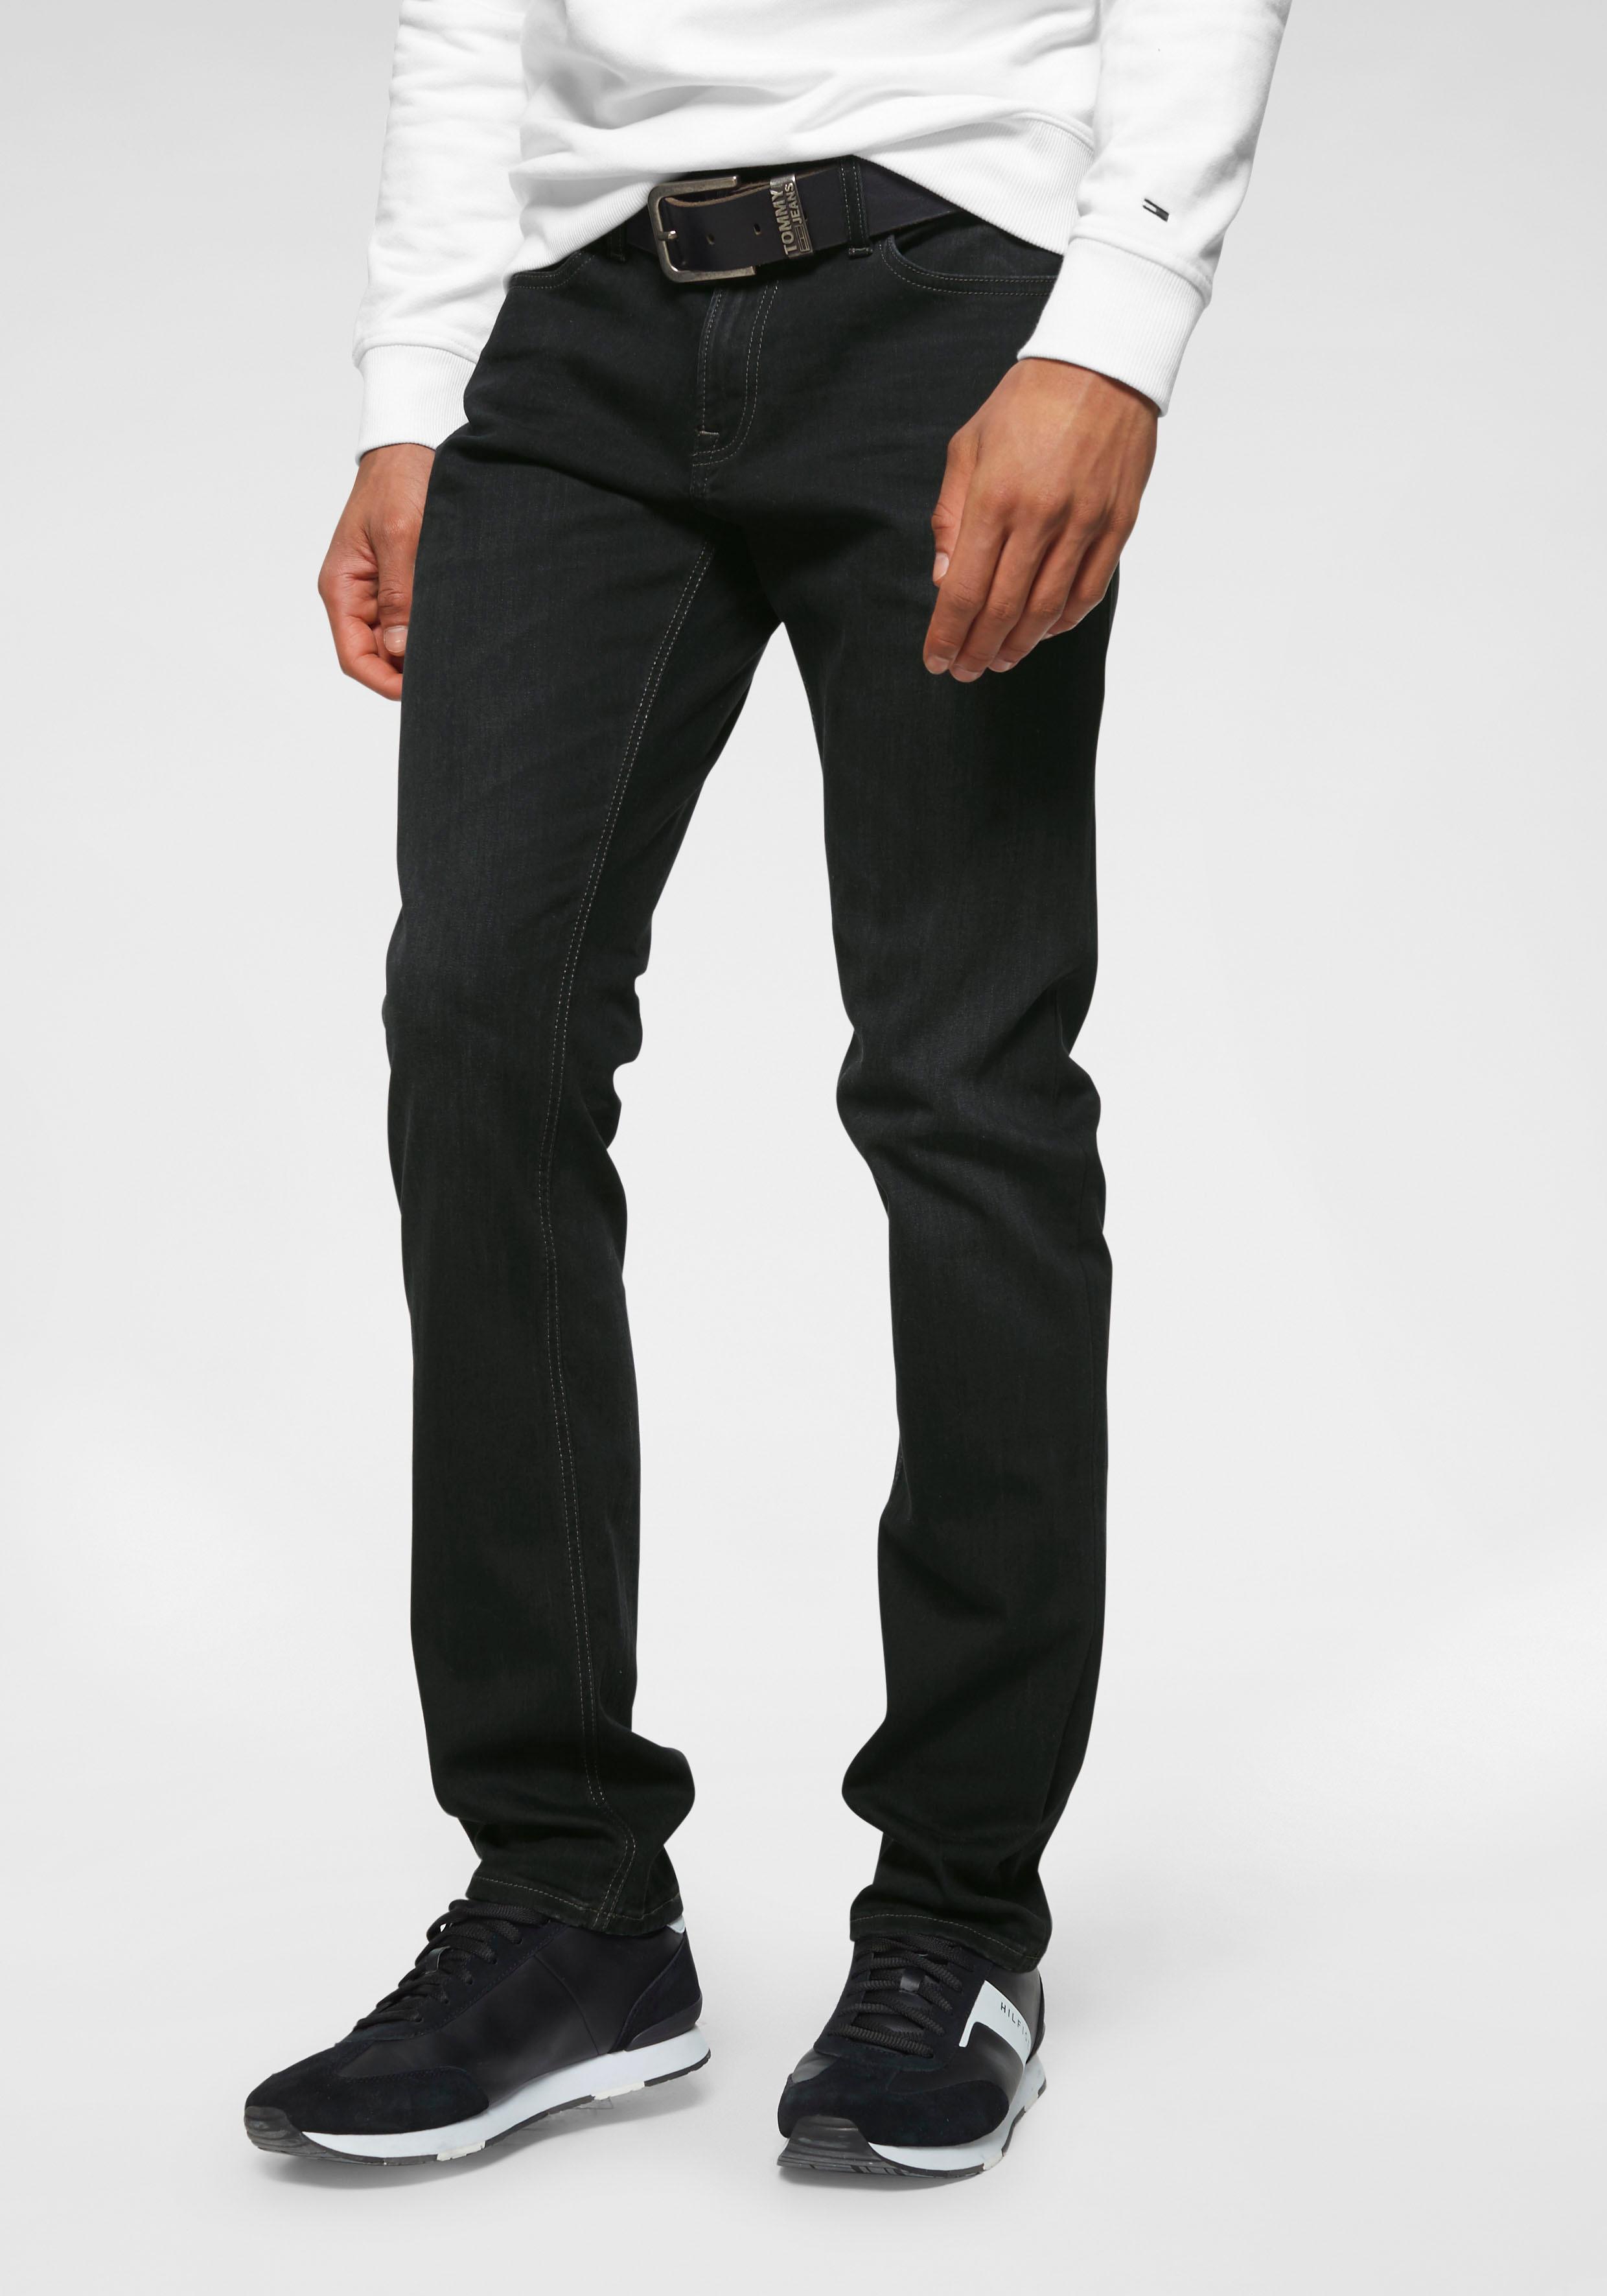 TOMMY JEANS Slim-fit-Jeans SLIM SCANTON CBLTB | Bekleidung > Jeans > Slim Fit Jeans | Schwarz | Jeans | Tommy Jeans